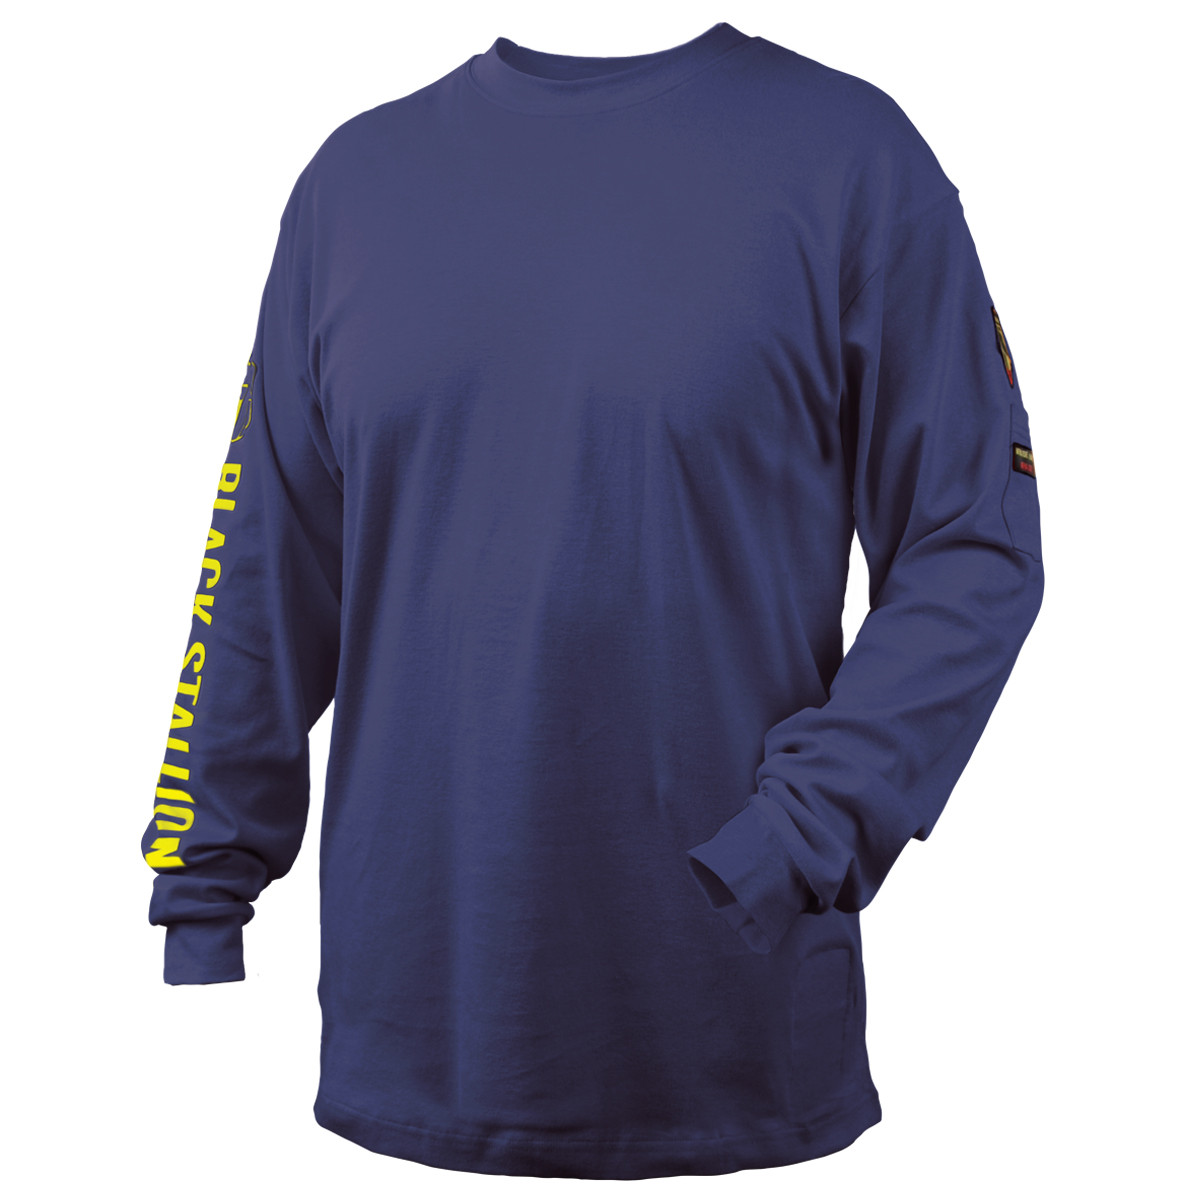 FR Cotton Knit Long-Sleeve T Black Stallion TF2510-GY NFPA 2112 /& NFPA70E 7 oz